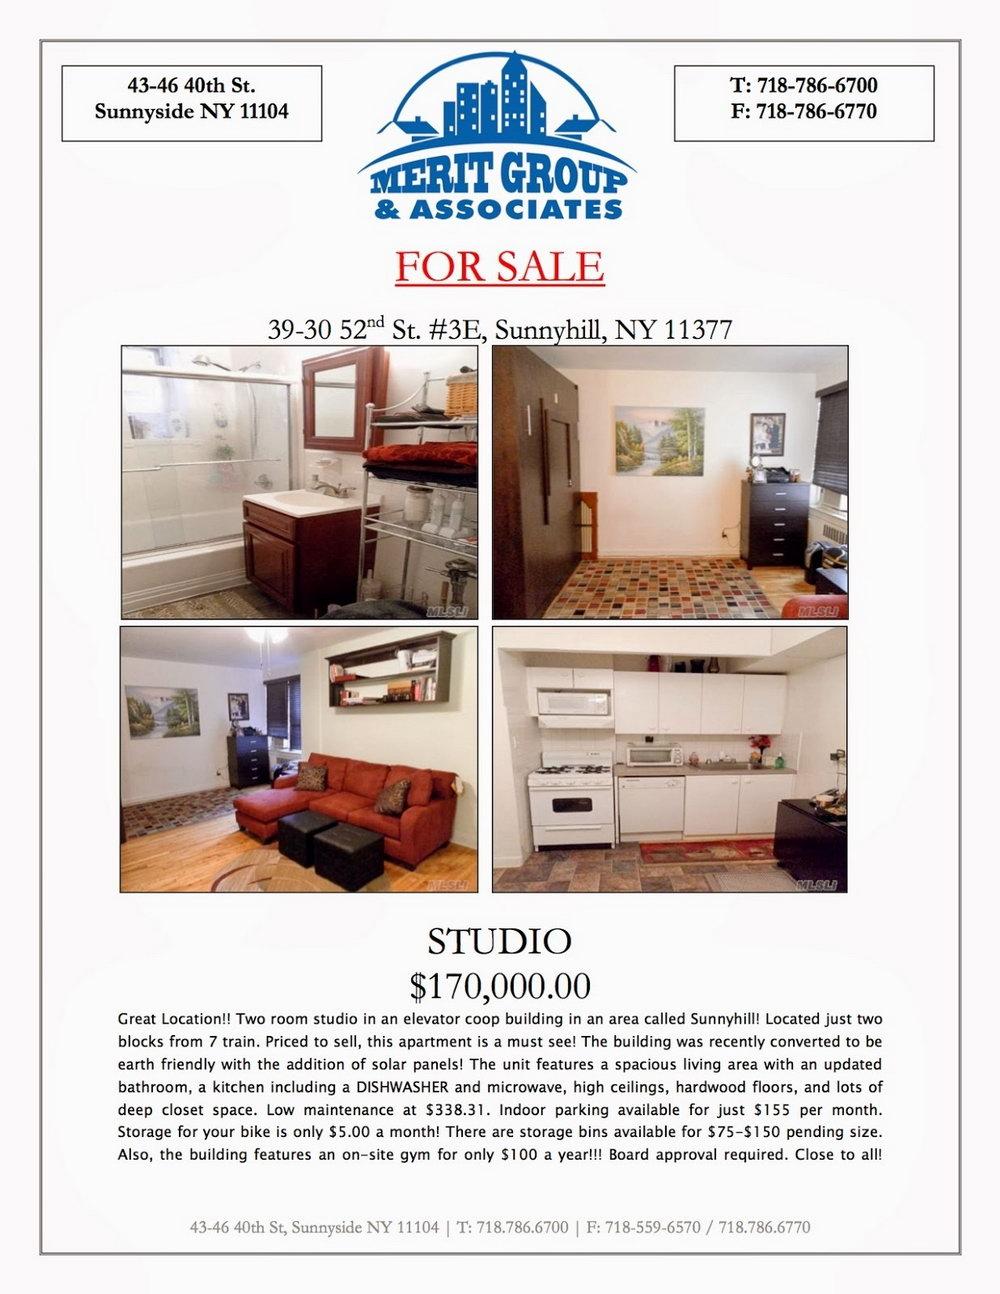 Apartment Rental Flyer Template